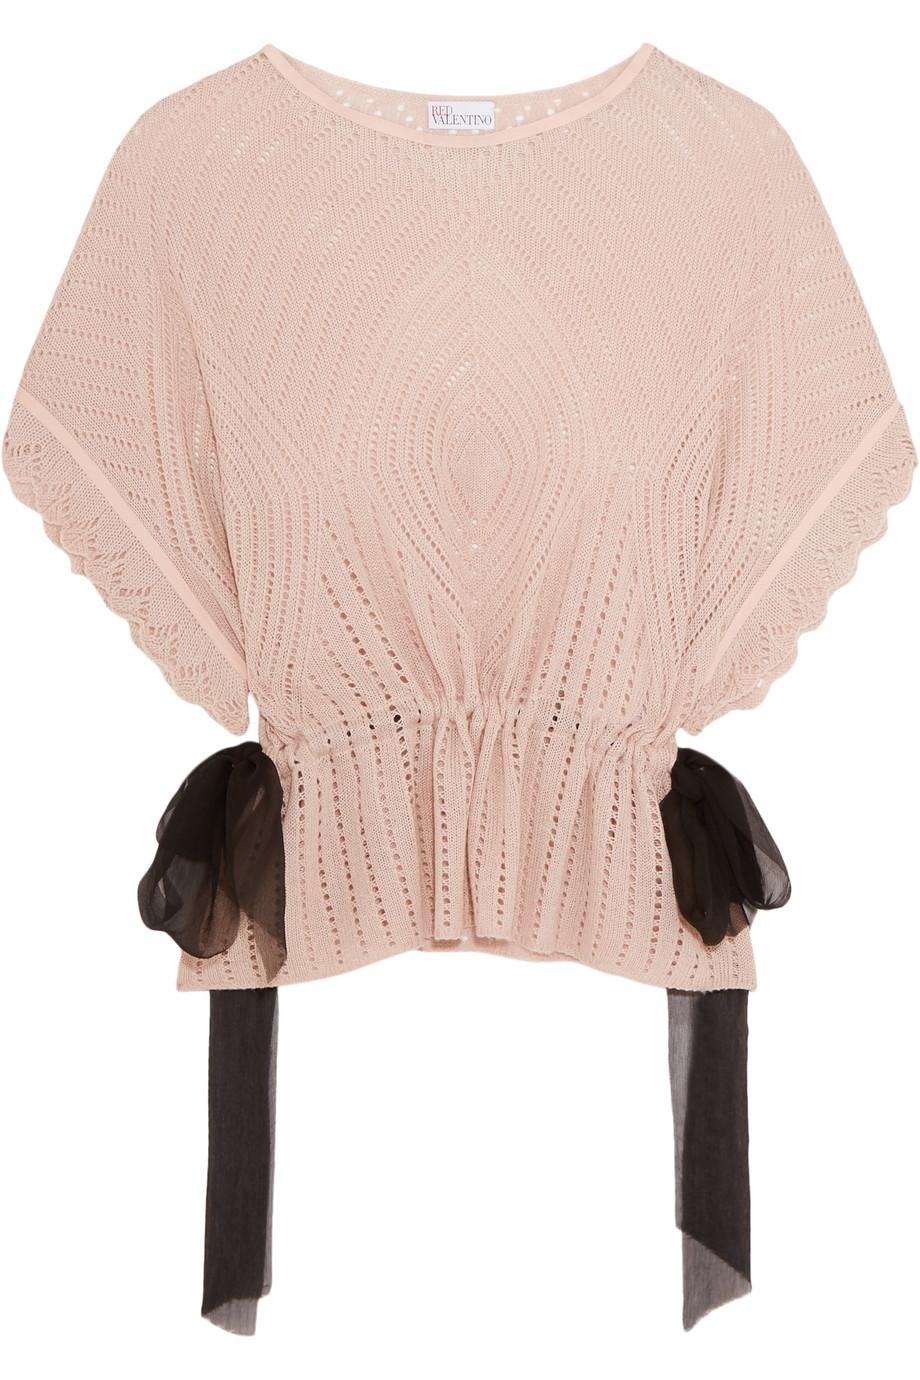 Redvalentino Crochet-Knit Sweater, Blush, Women's, Size: L